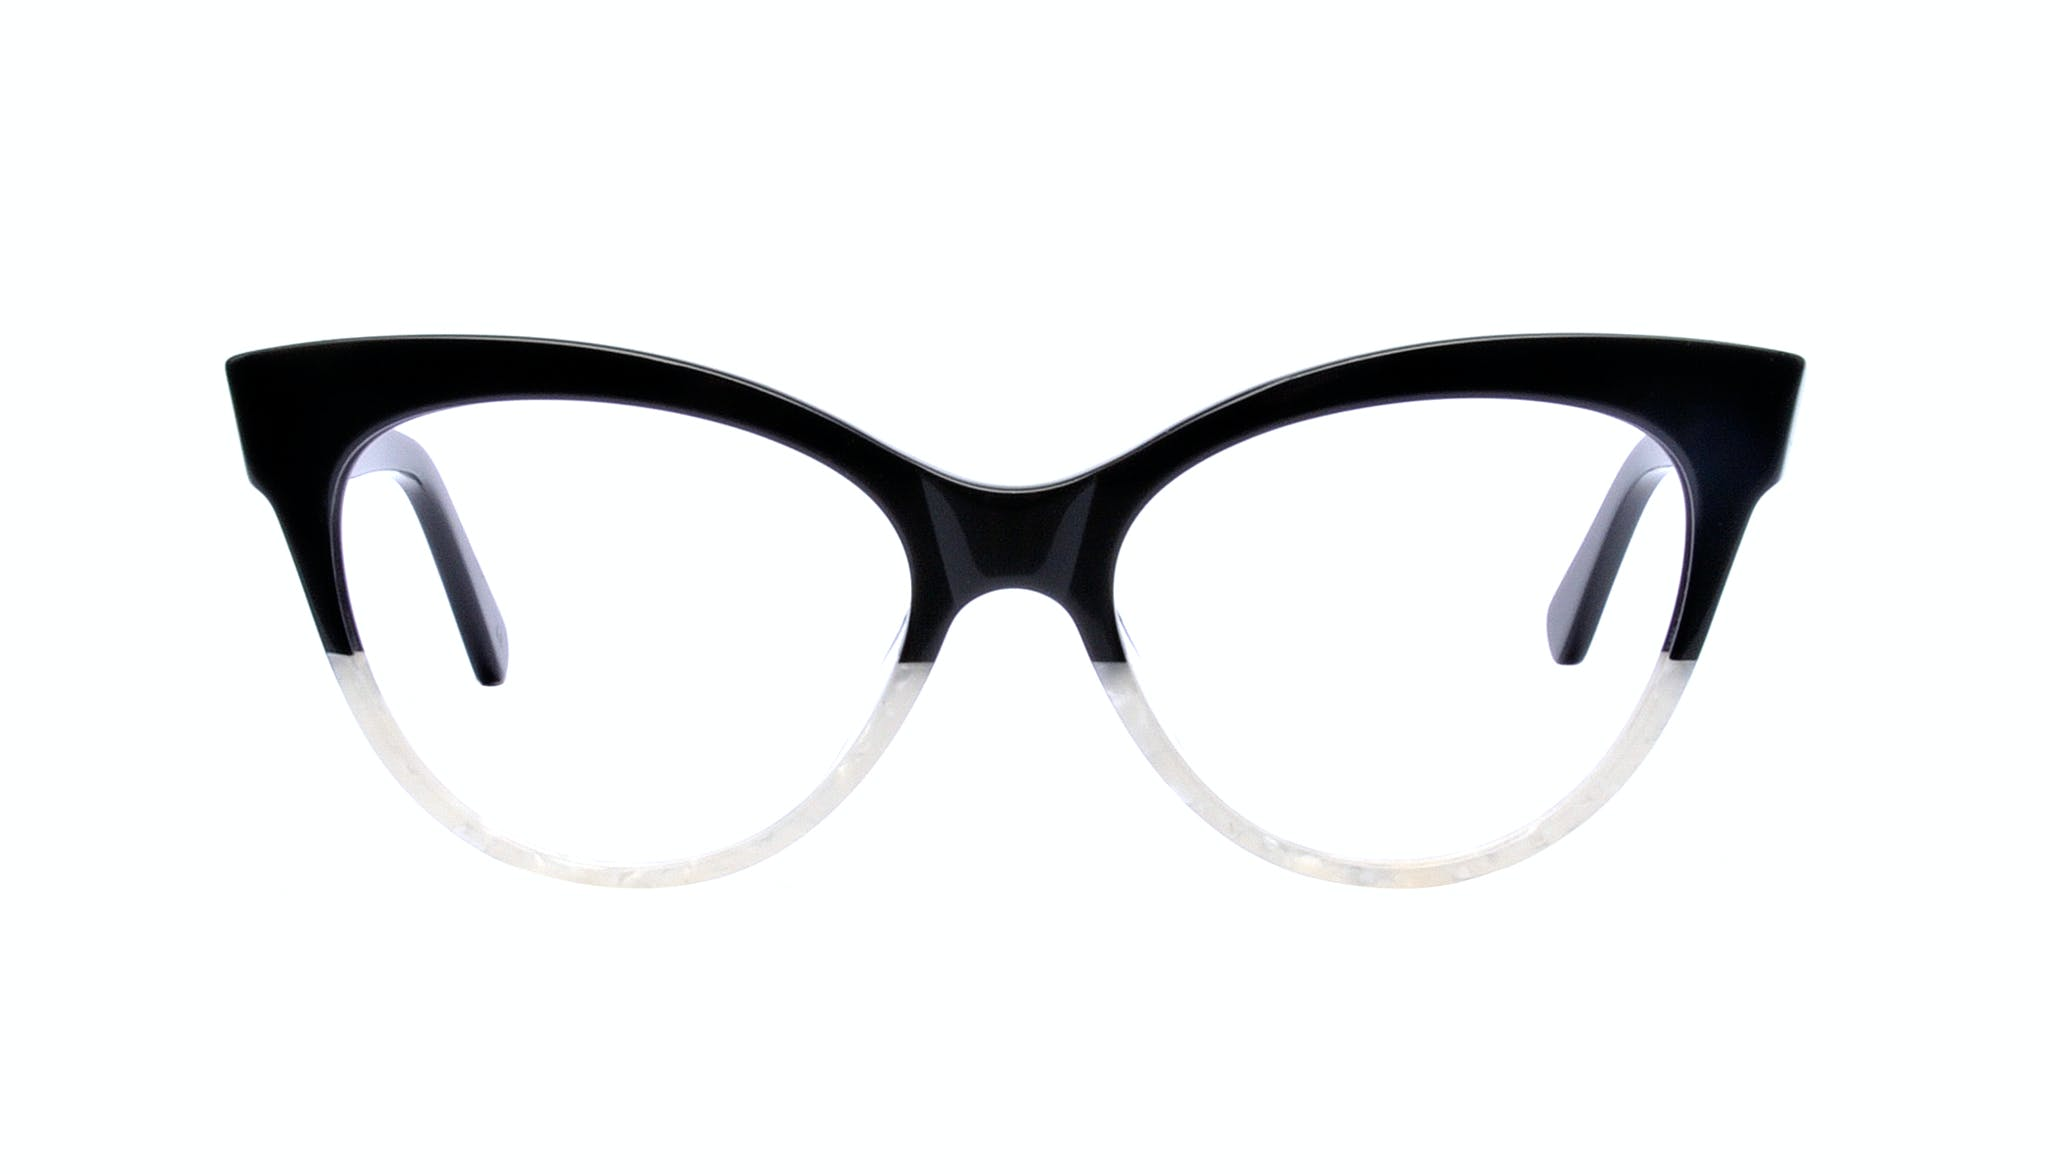 Affordable Fashion Glasses Cat Eye Daring Cateye Eyeglasses Women SkunkBoy Panda Pearl Front